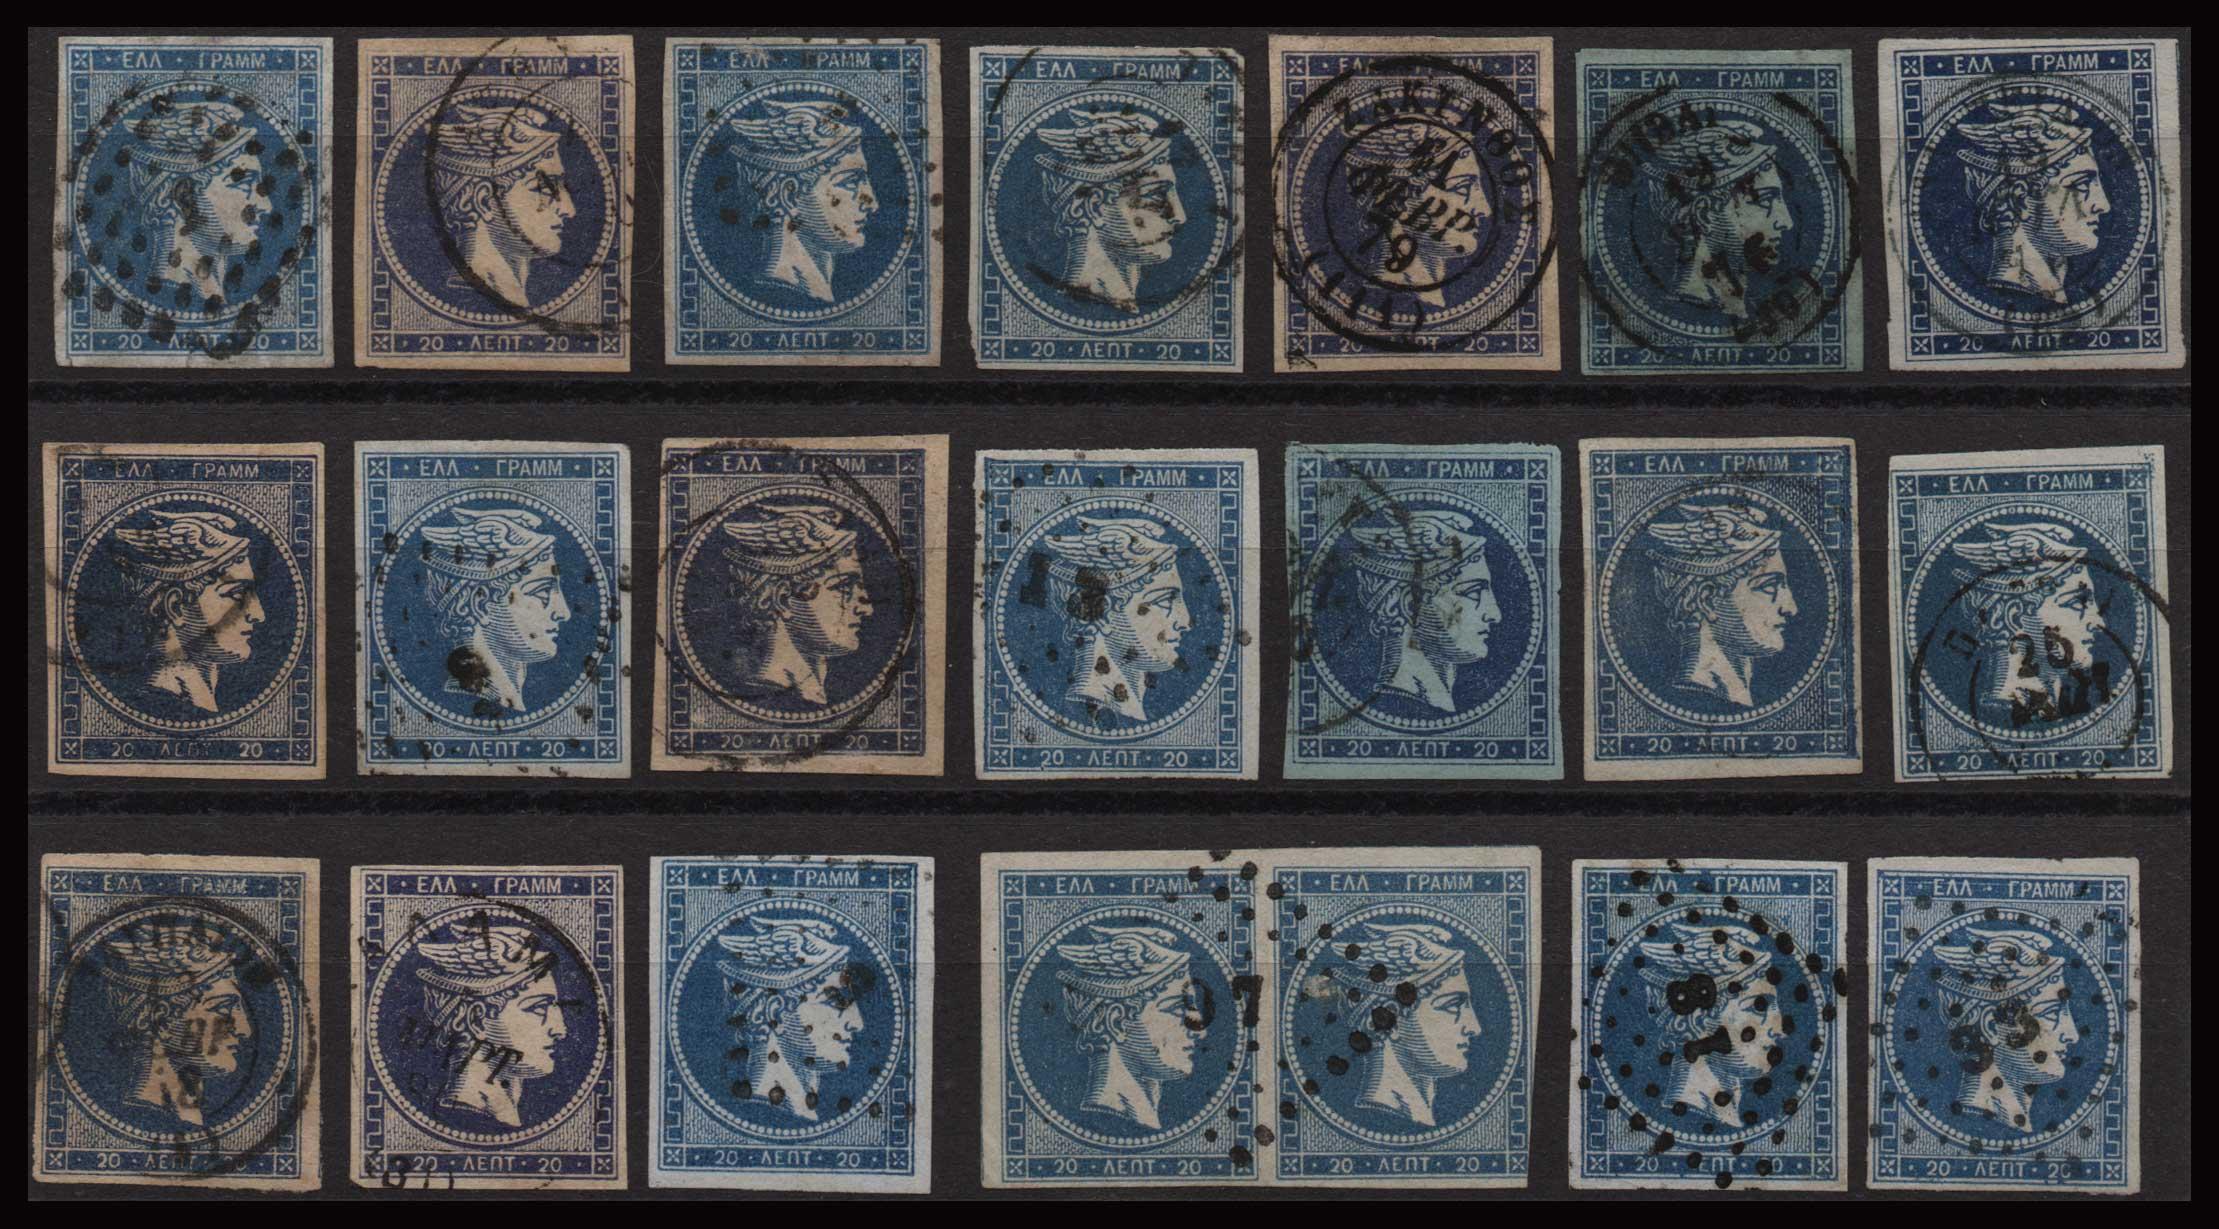 Lot 20 - -  LARGE HERMES HEAD large hermes head -  Athens Auctions Public Auction 81General Stamp Sale